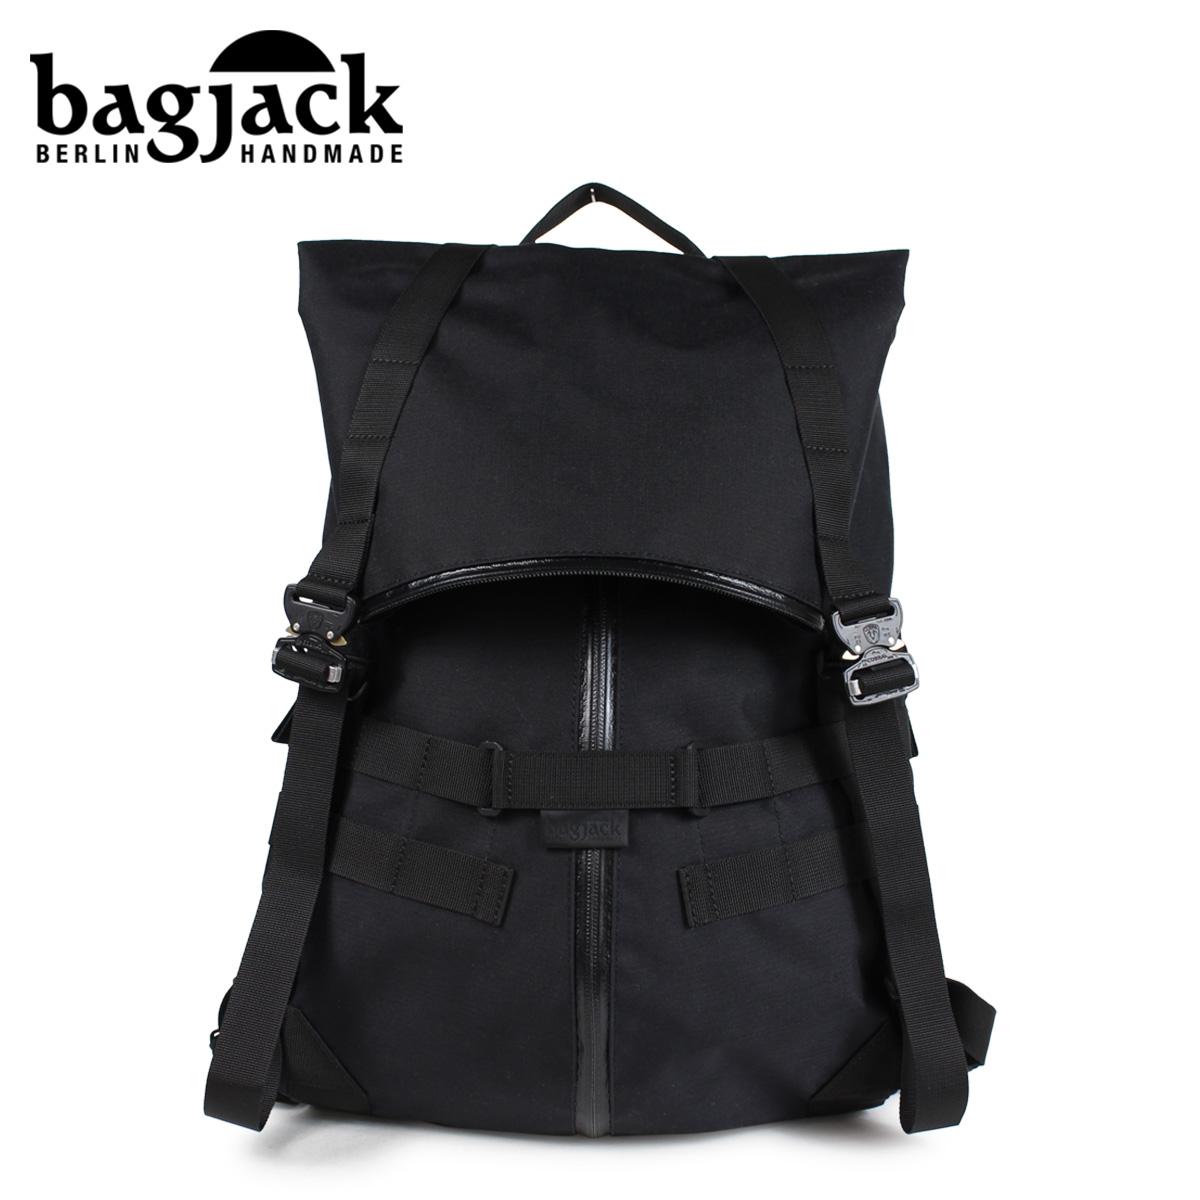 bagjack バッグジャック リュック バックパック メンズ レディース MORPH PACK ブラック